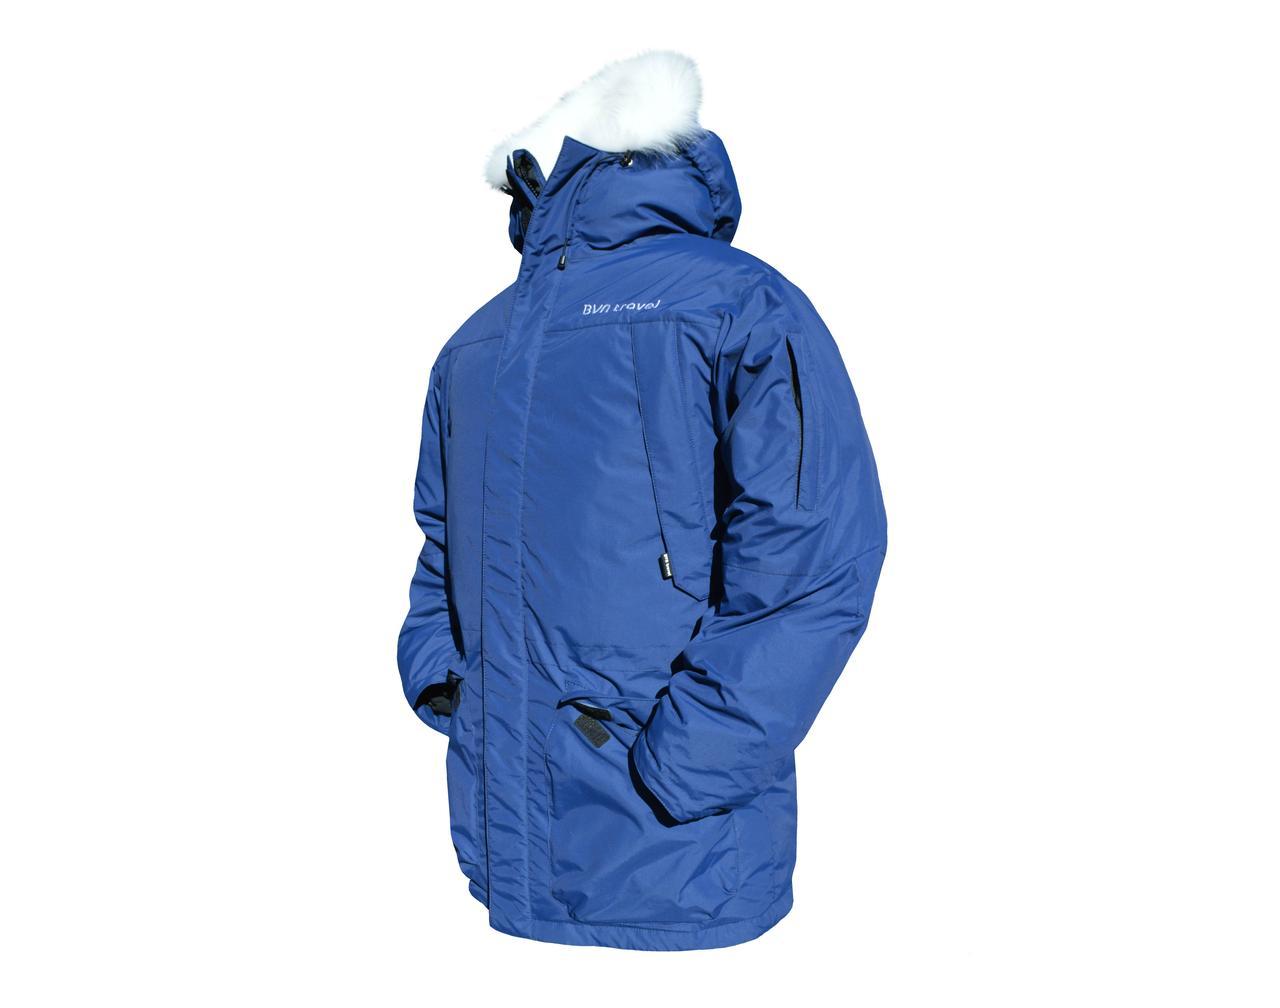 Мужской пуховик Аляска 2 С опушкой, 48 50182 188, Синий